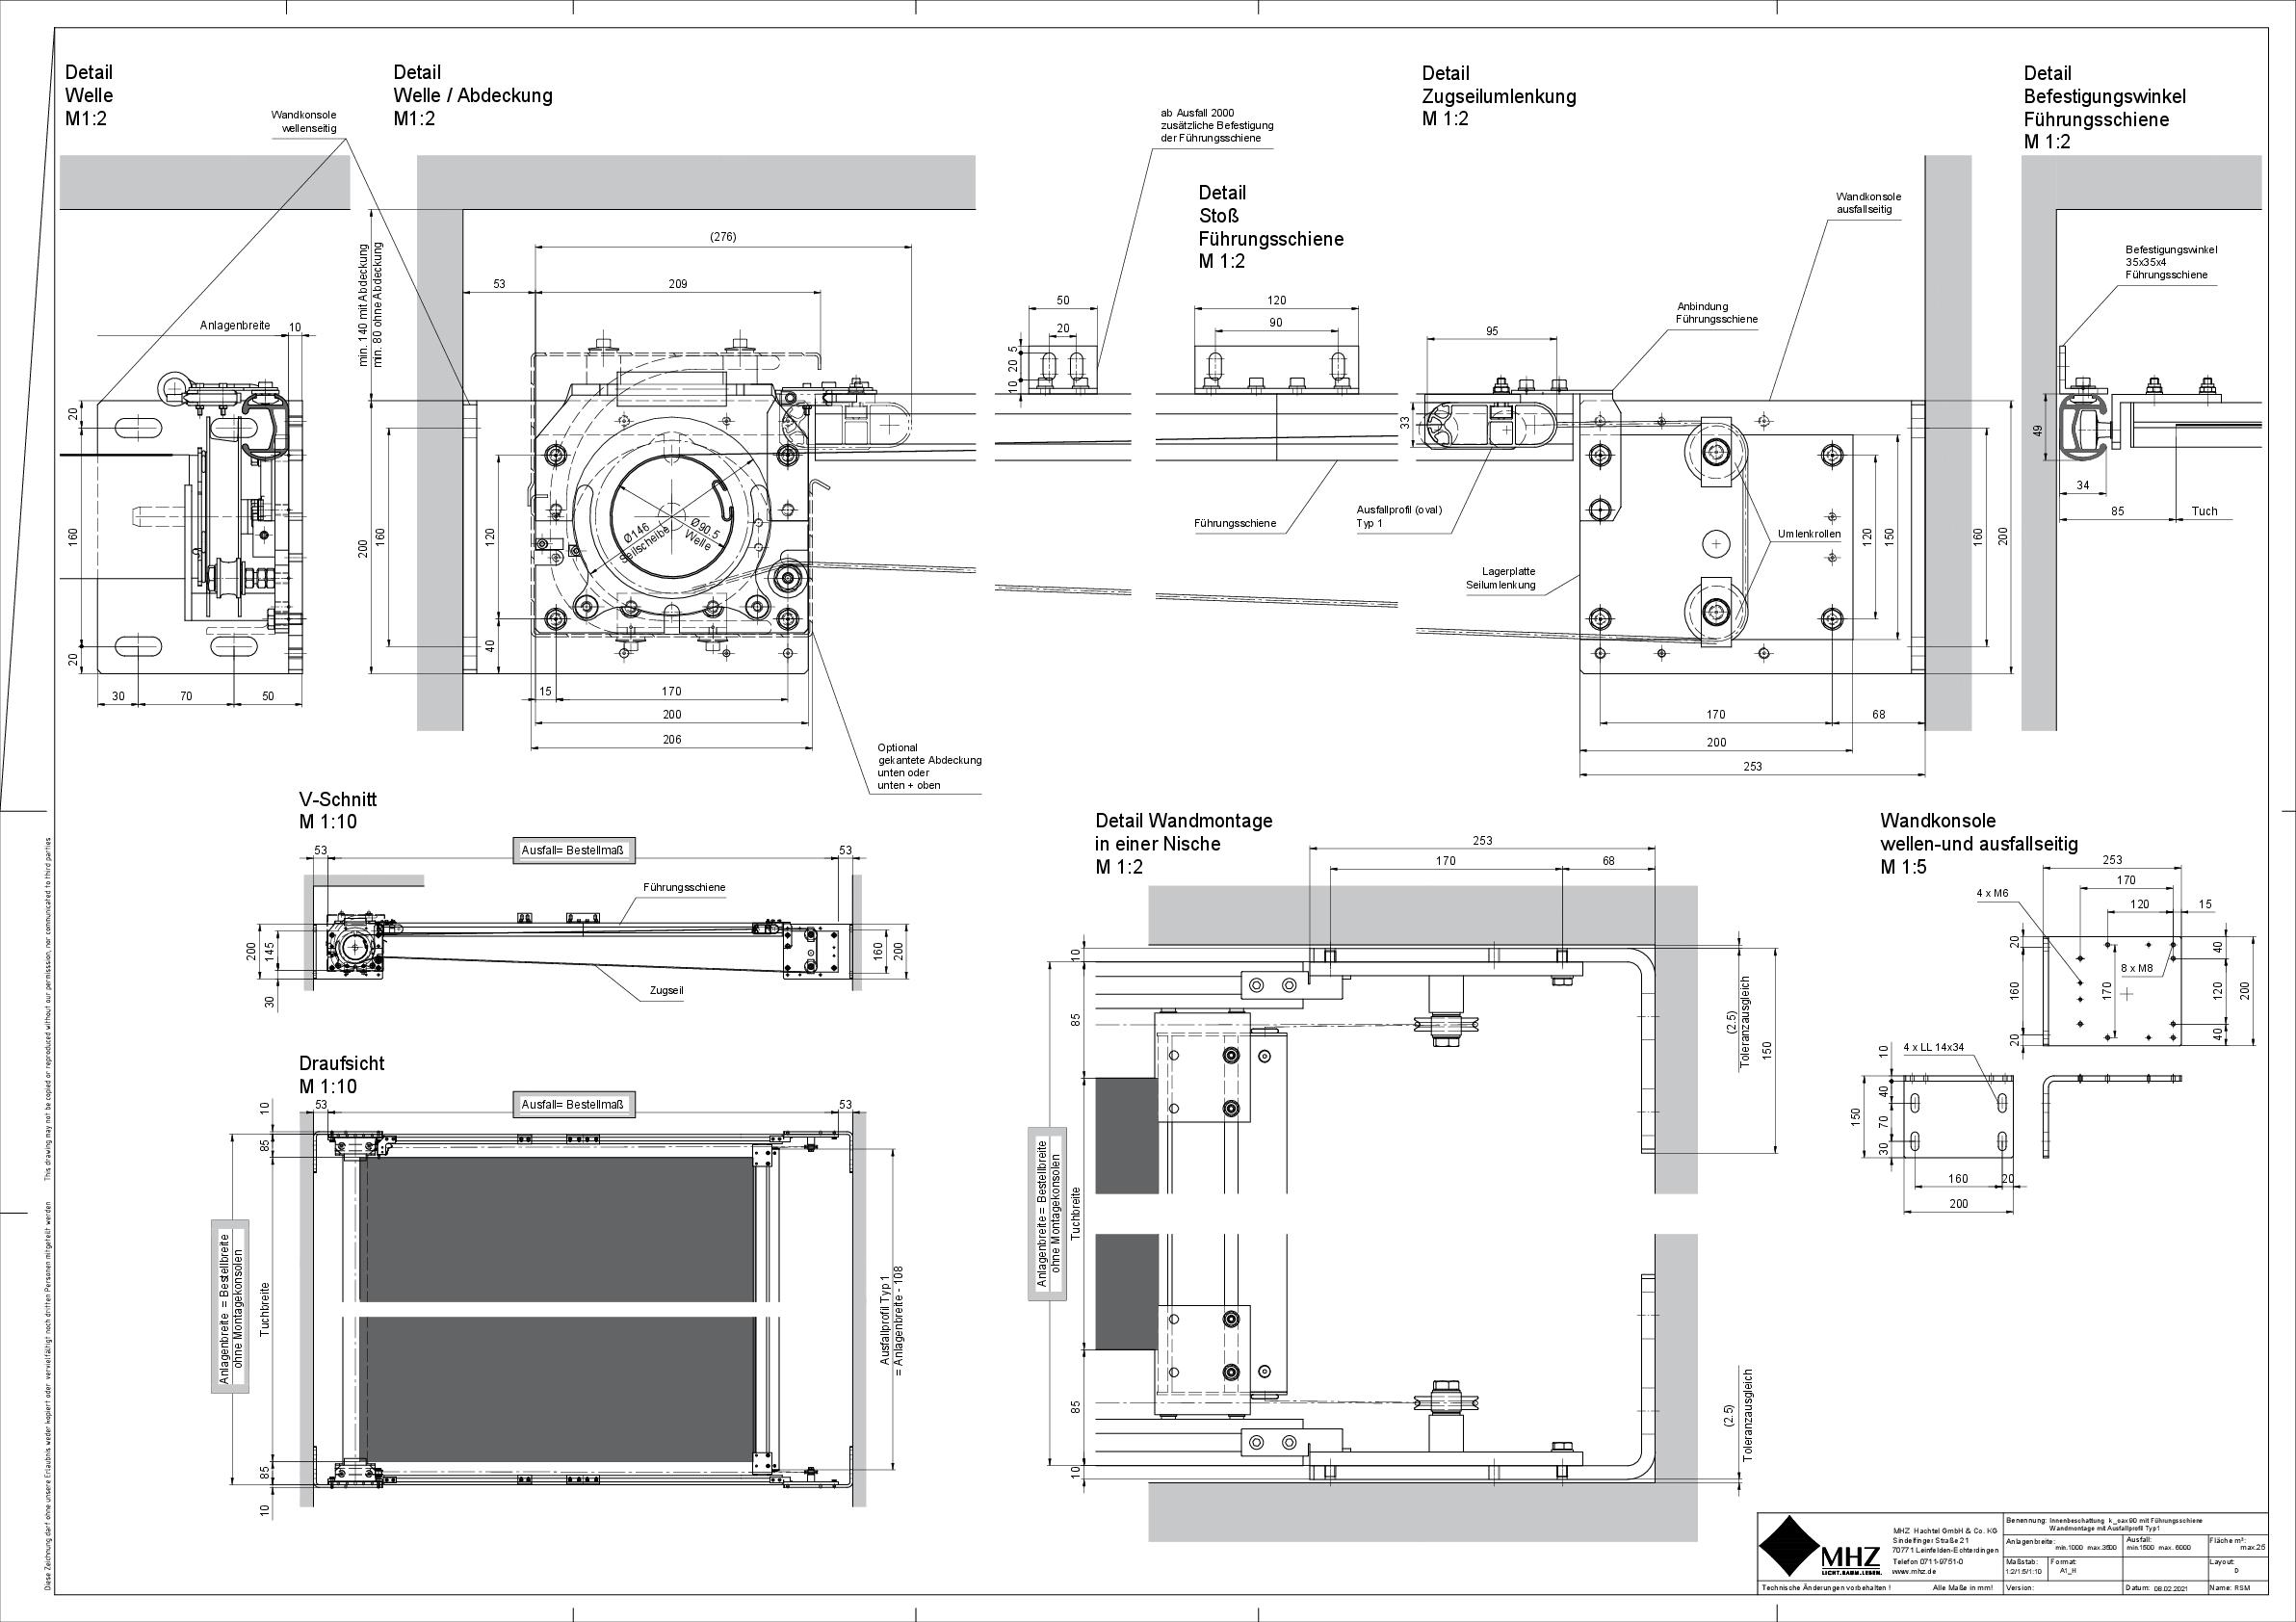 Technische Zeichnung pdf Beschattung k_oax 90